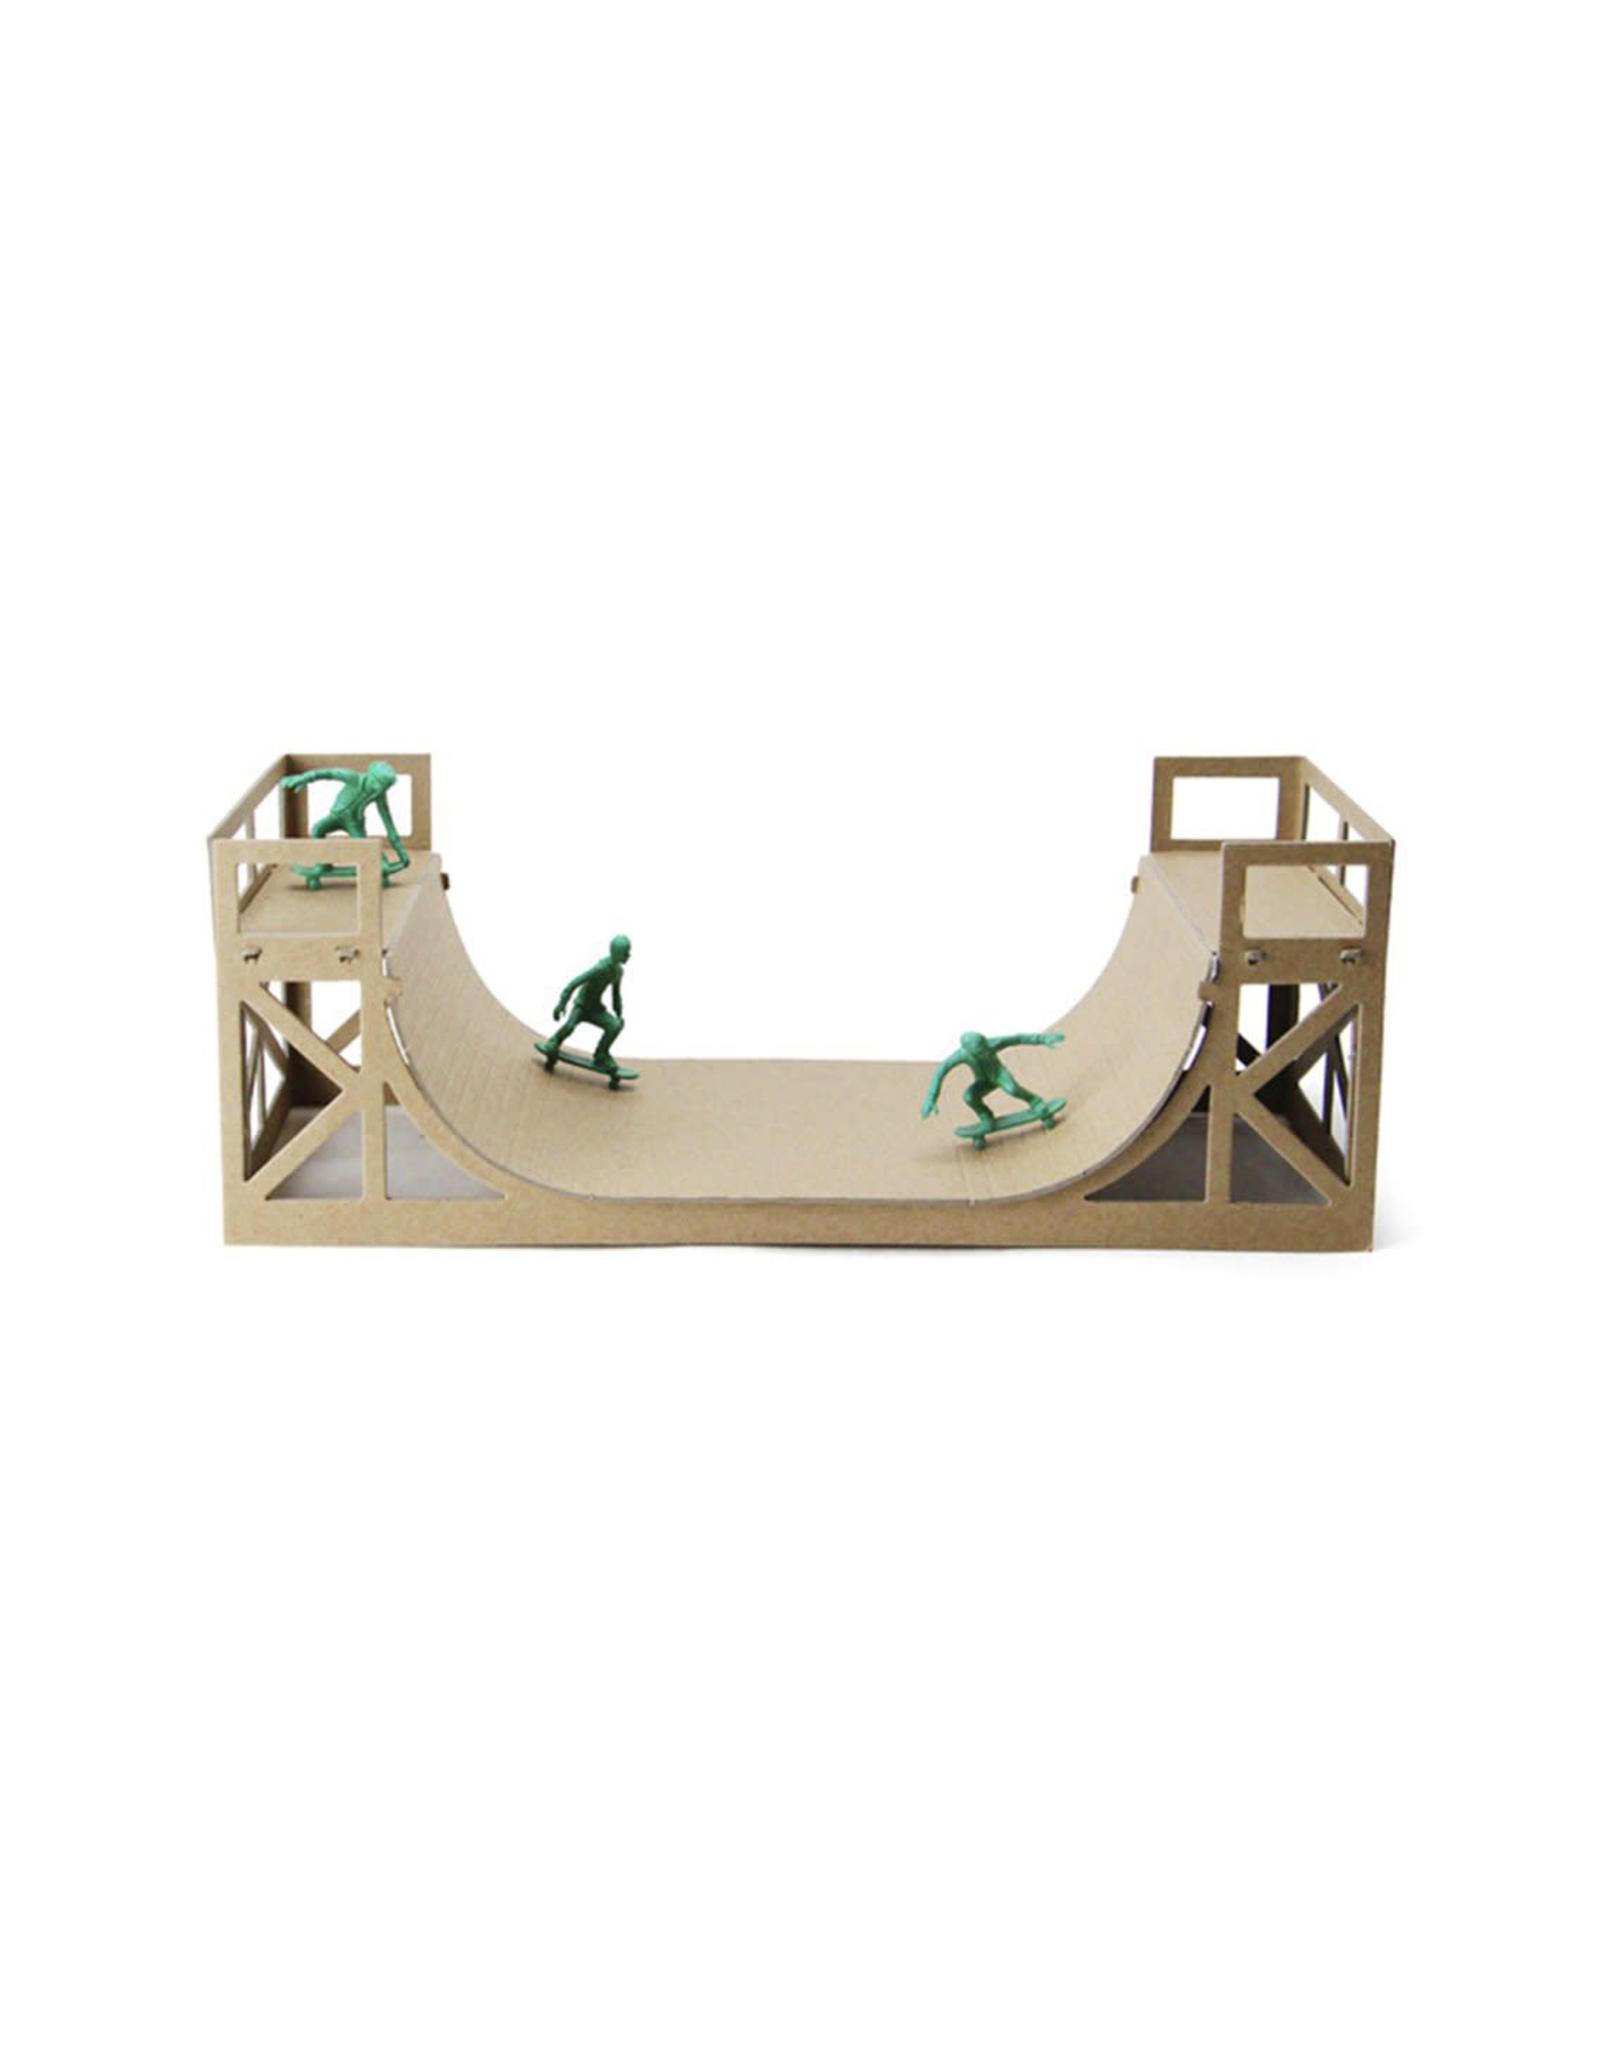 Brooklyn Bound Half Pike Model Kit